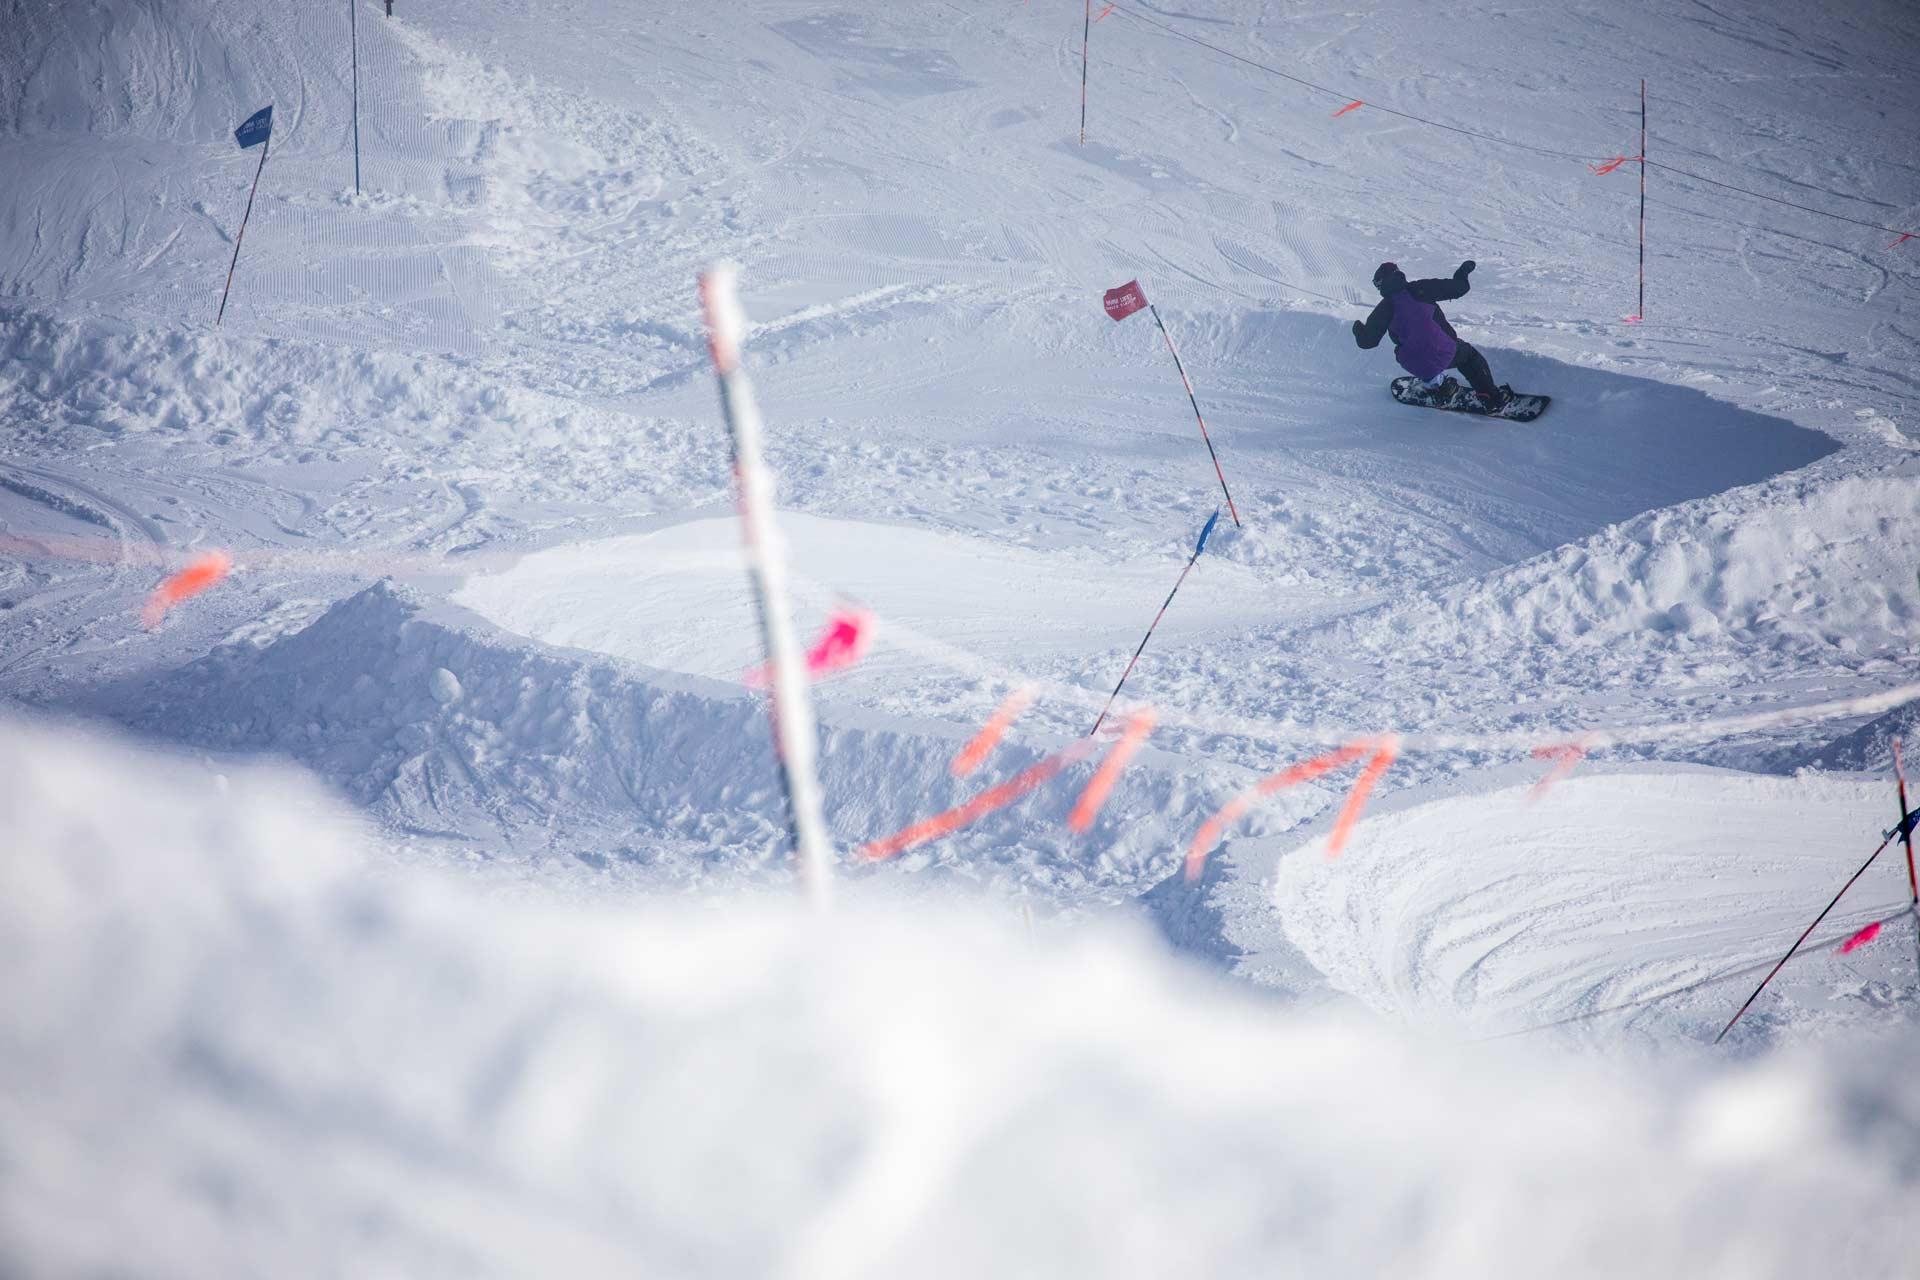 19-20 JHSM. Snowboarding. Smash Life. Rider: Mike Scarfi. Photo: Ben Gavelda